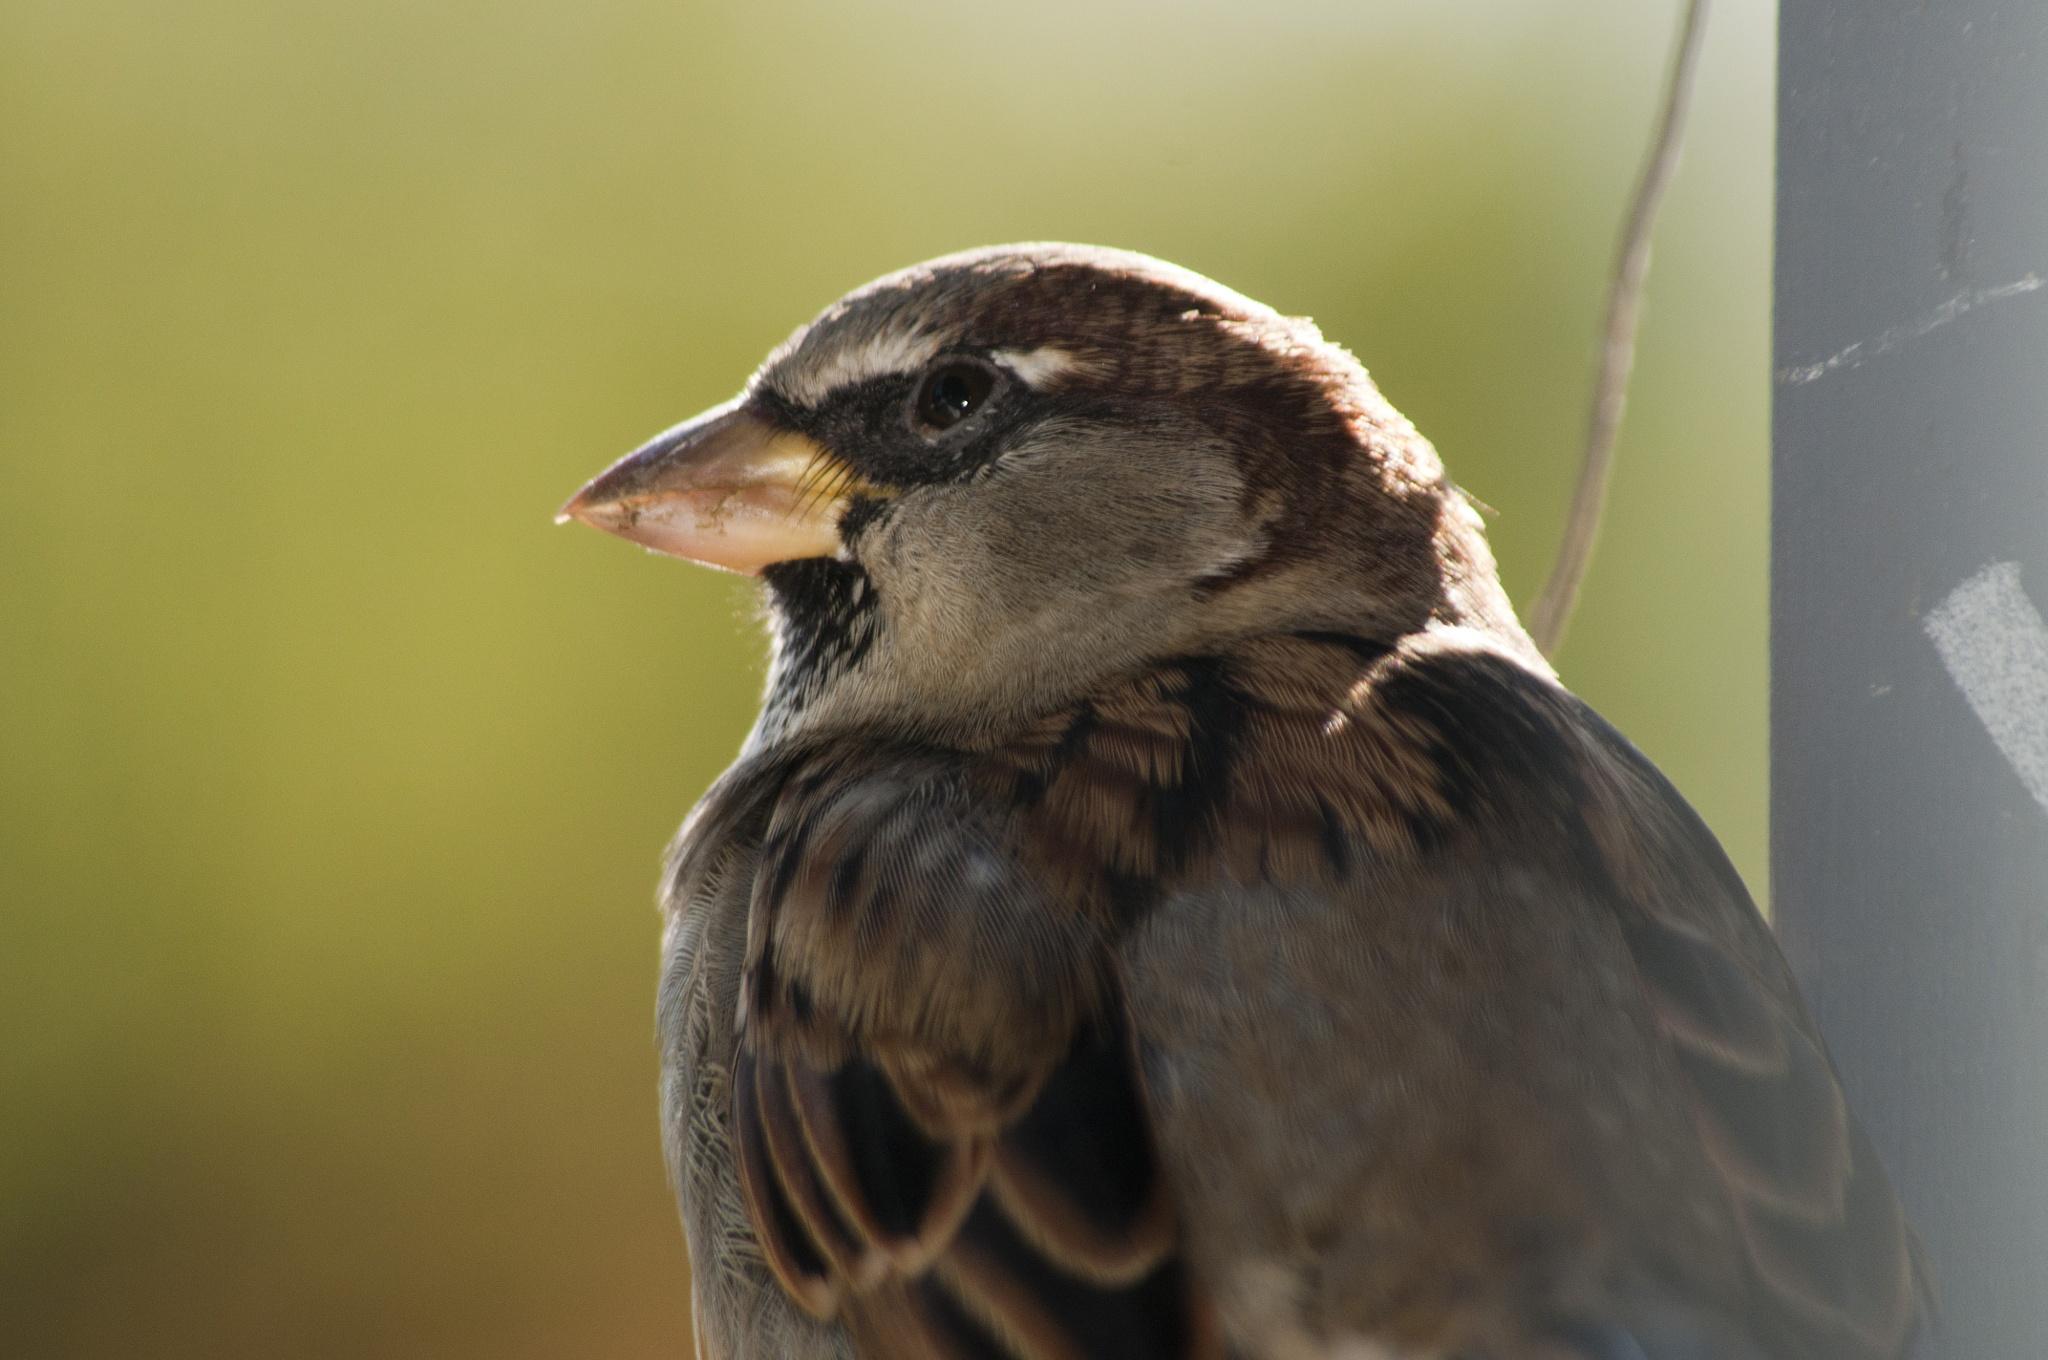 Sparrow 02 by Jay Hurd